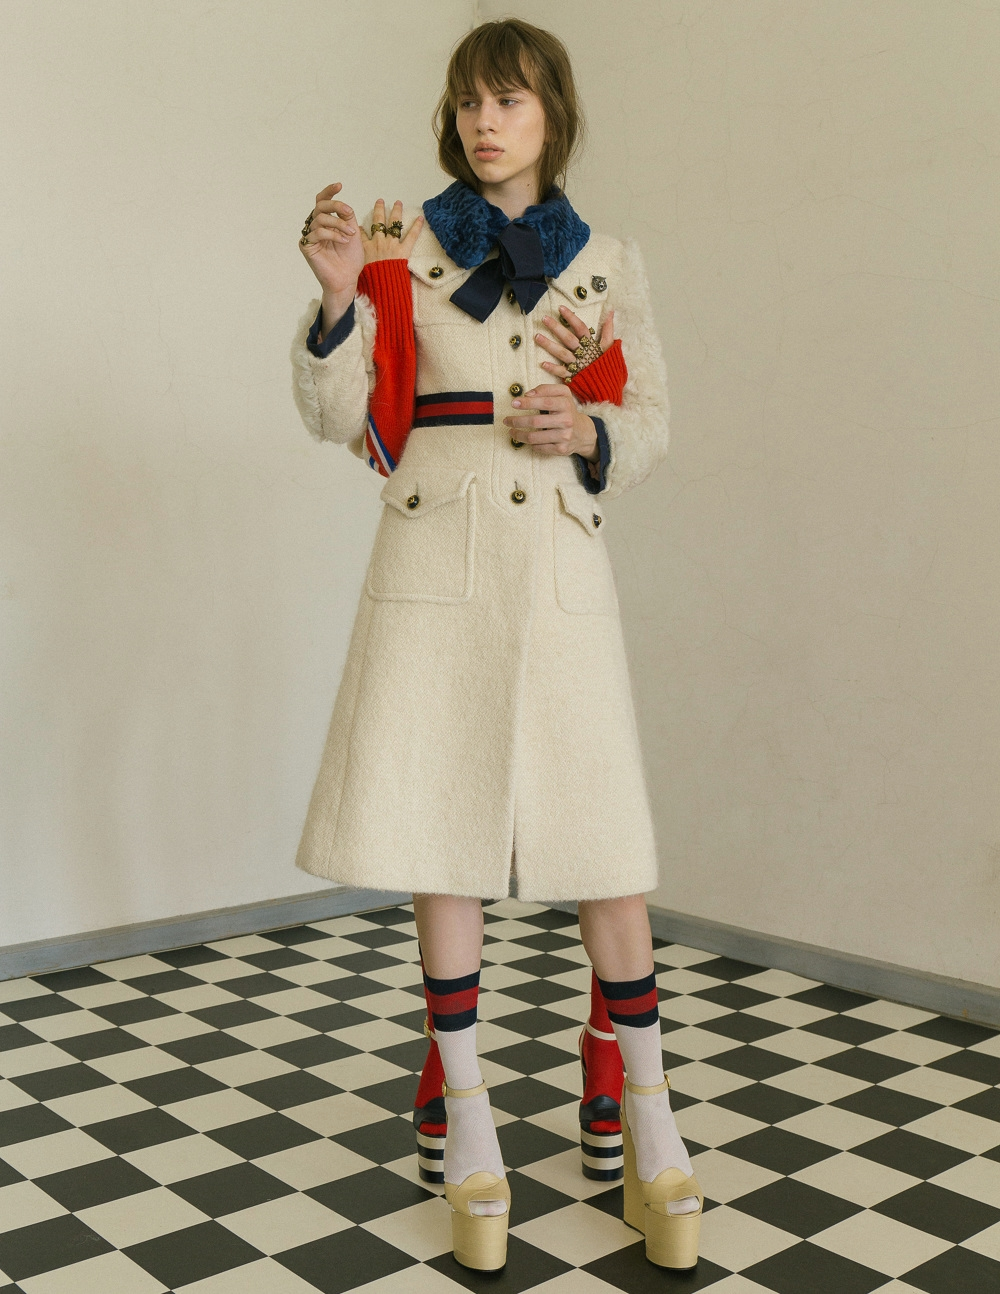 Photography Erik Panov - fashion - fashionphotography   ello